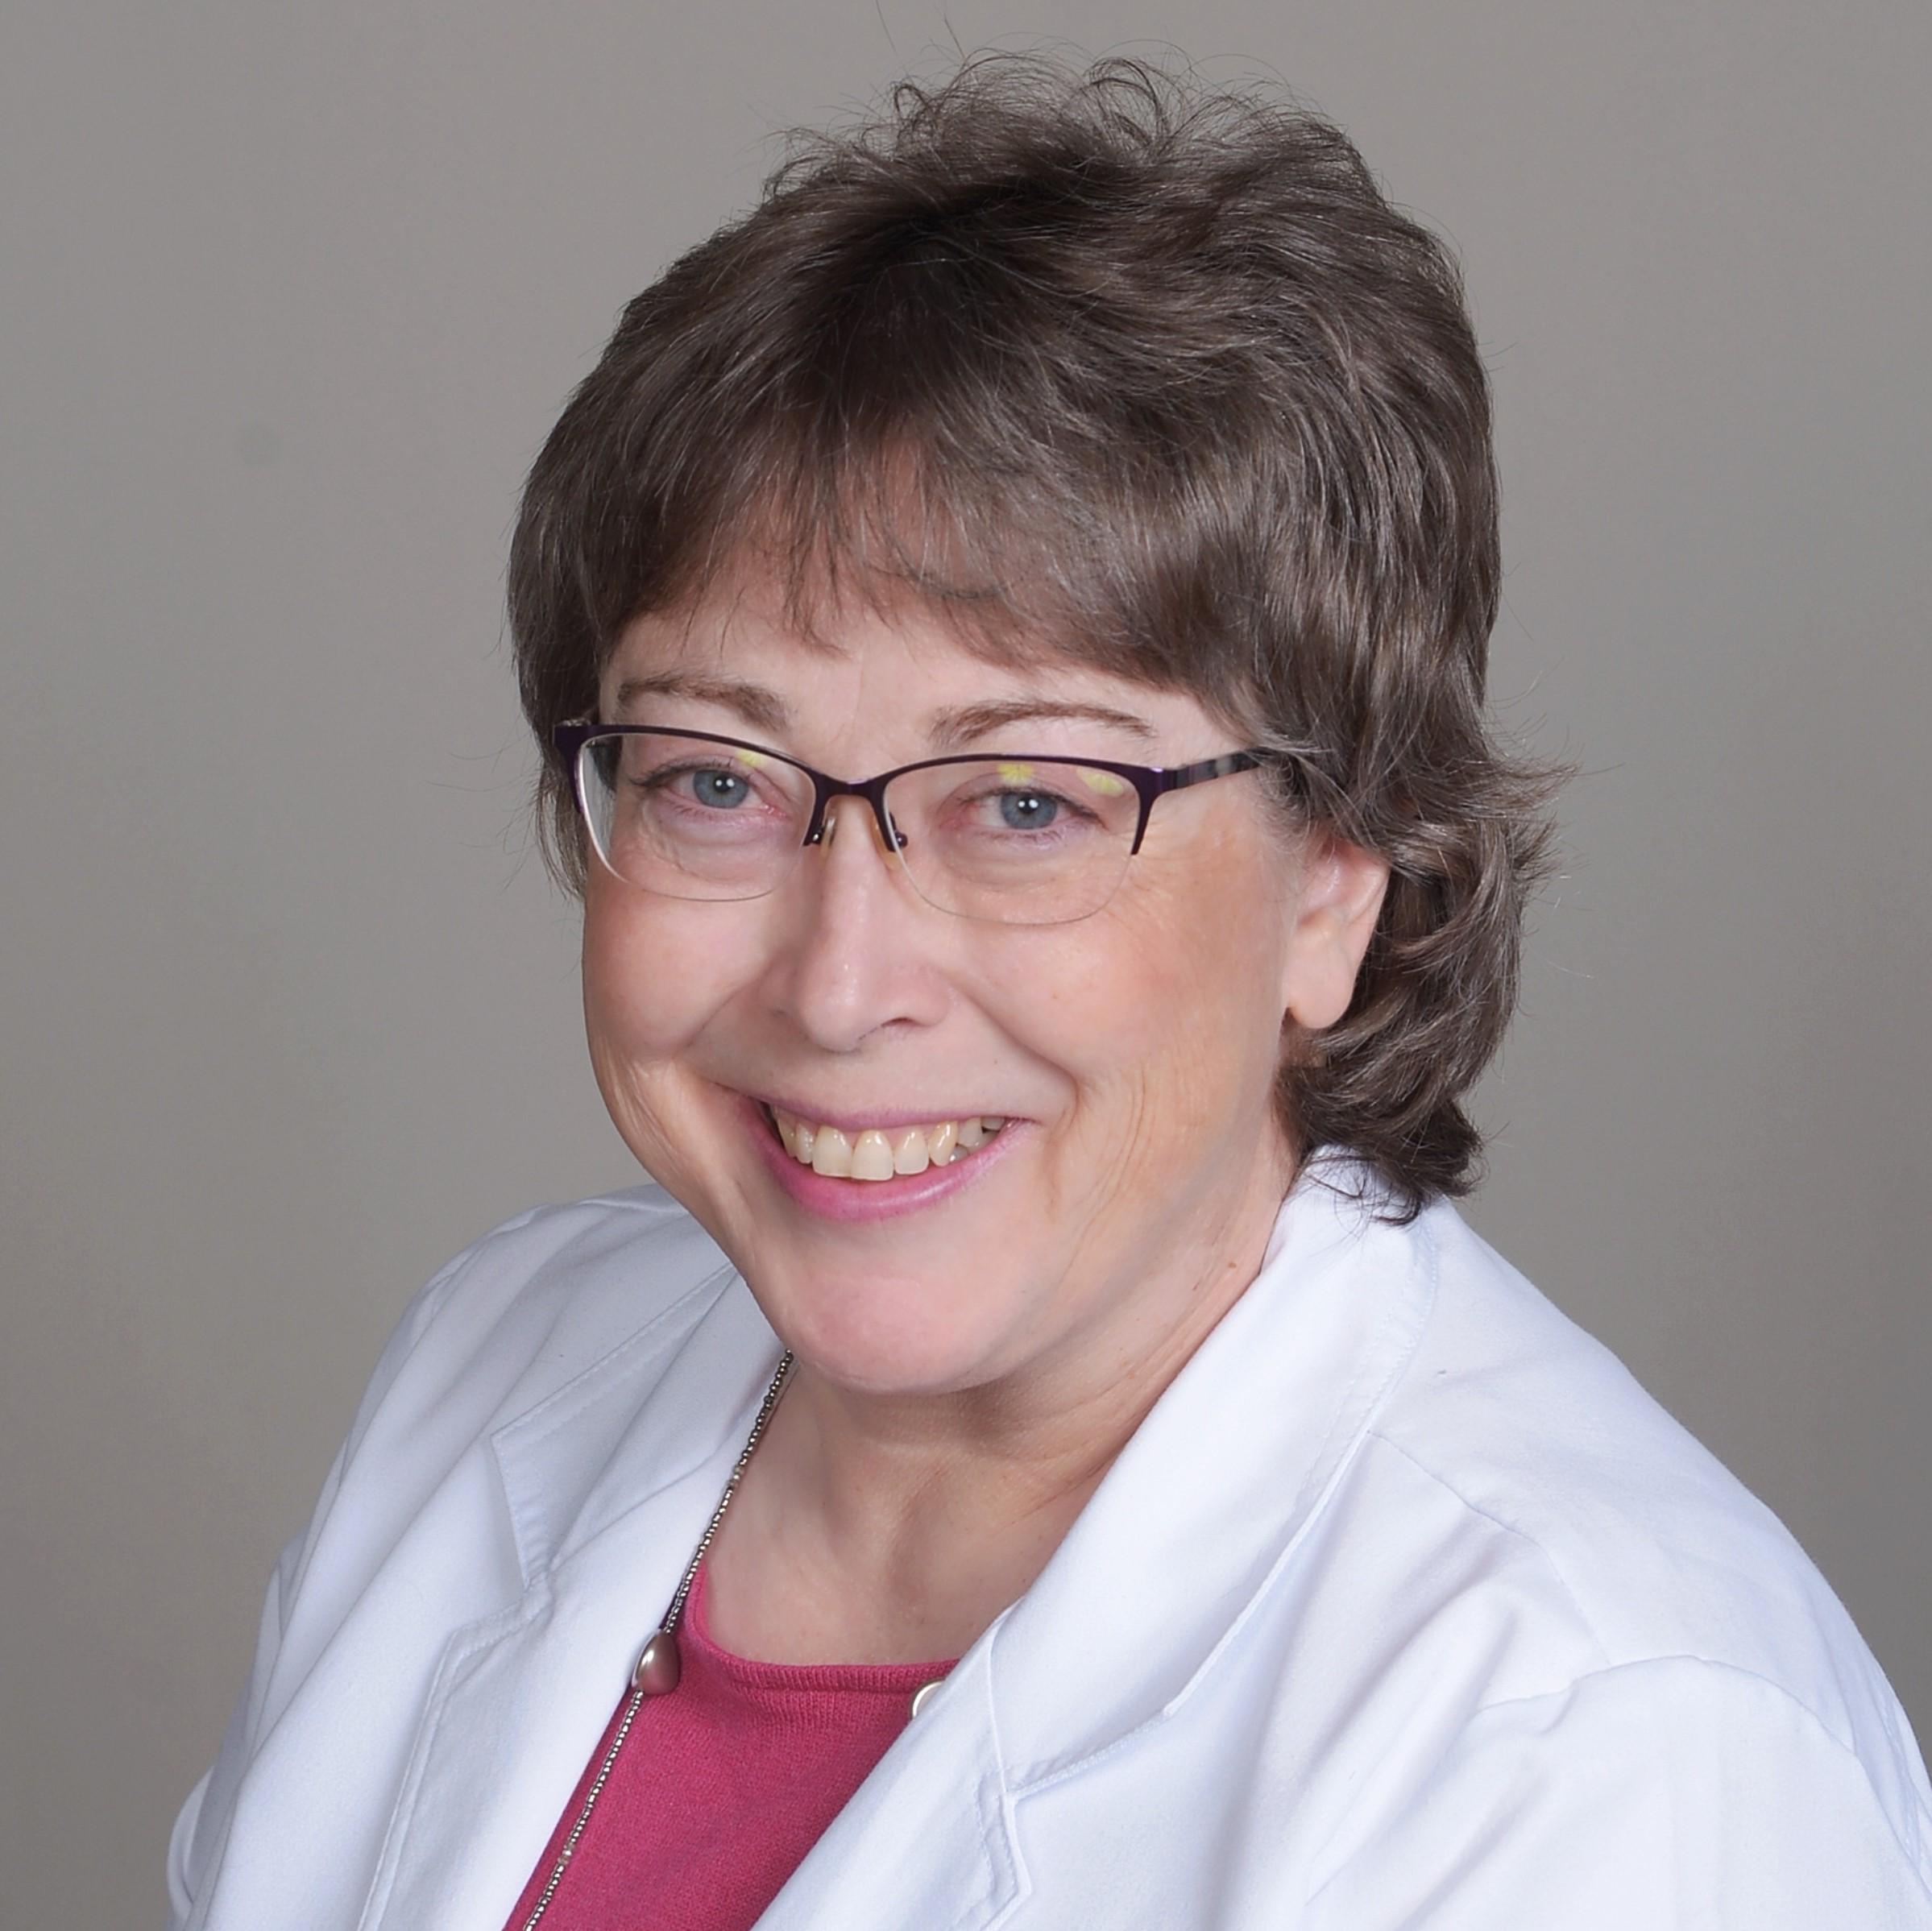 Dr. Lois Meacham - Shopko Optical optometrist